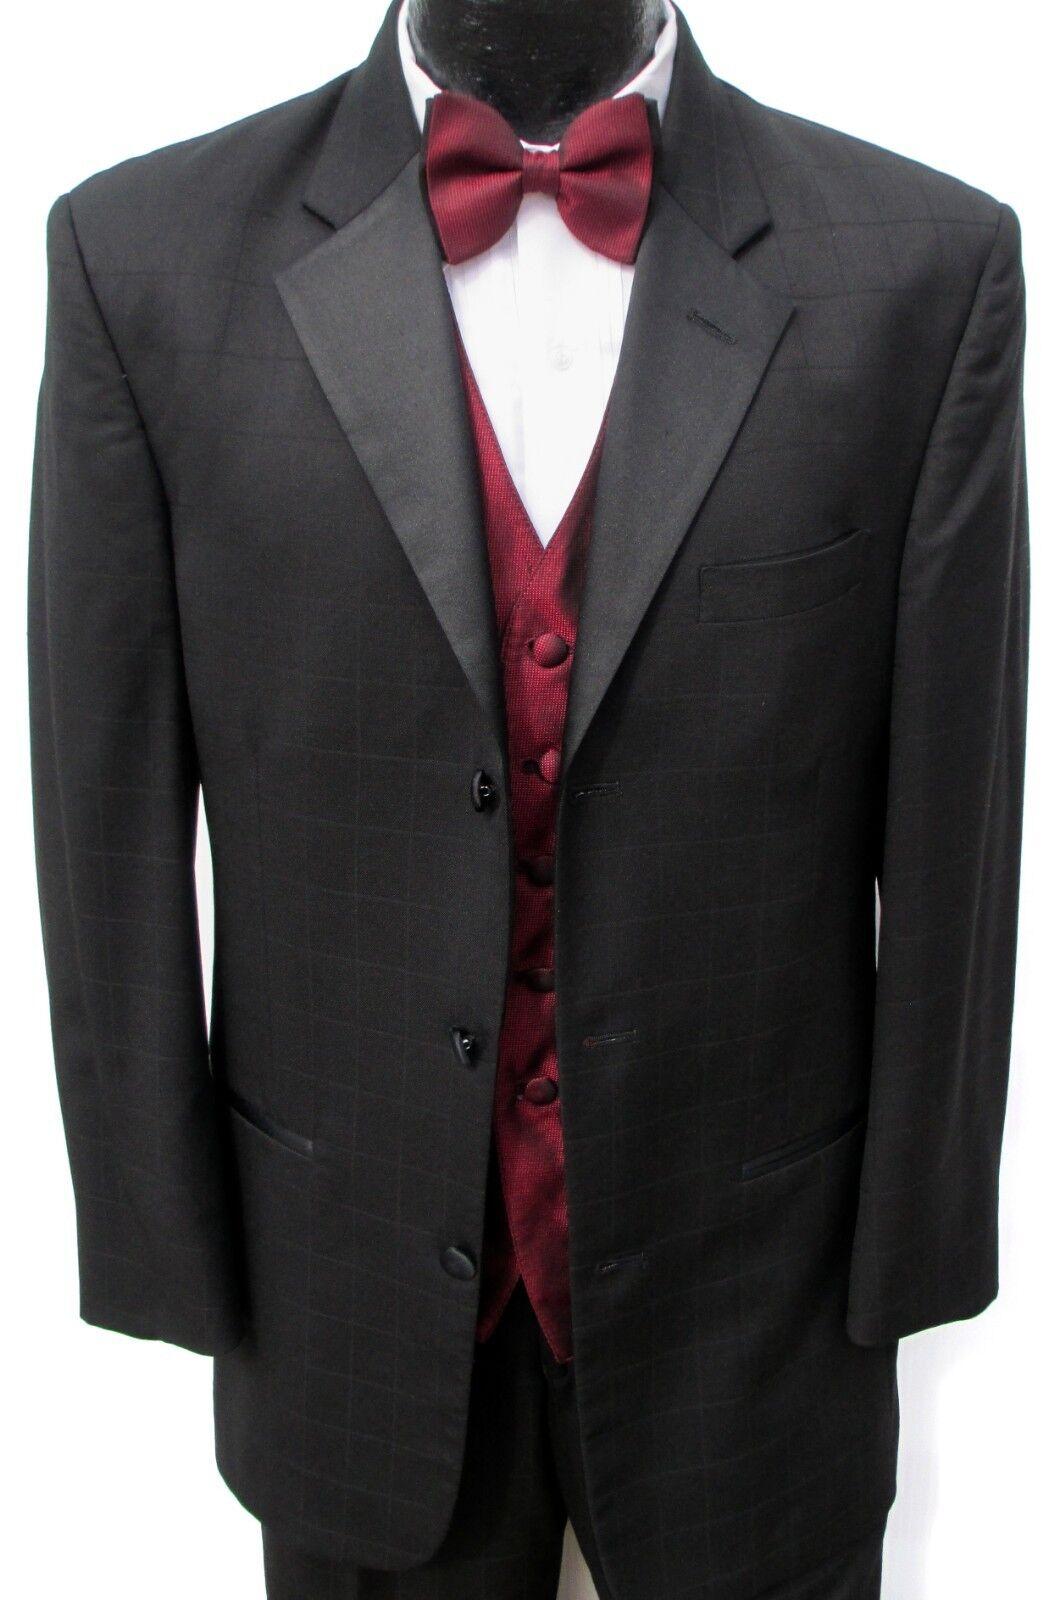 39R Mens Tuxedo Jacket & Pant Suit Overstock Sale Black Patterned Tux Prom Party